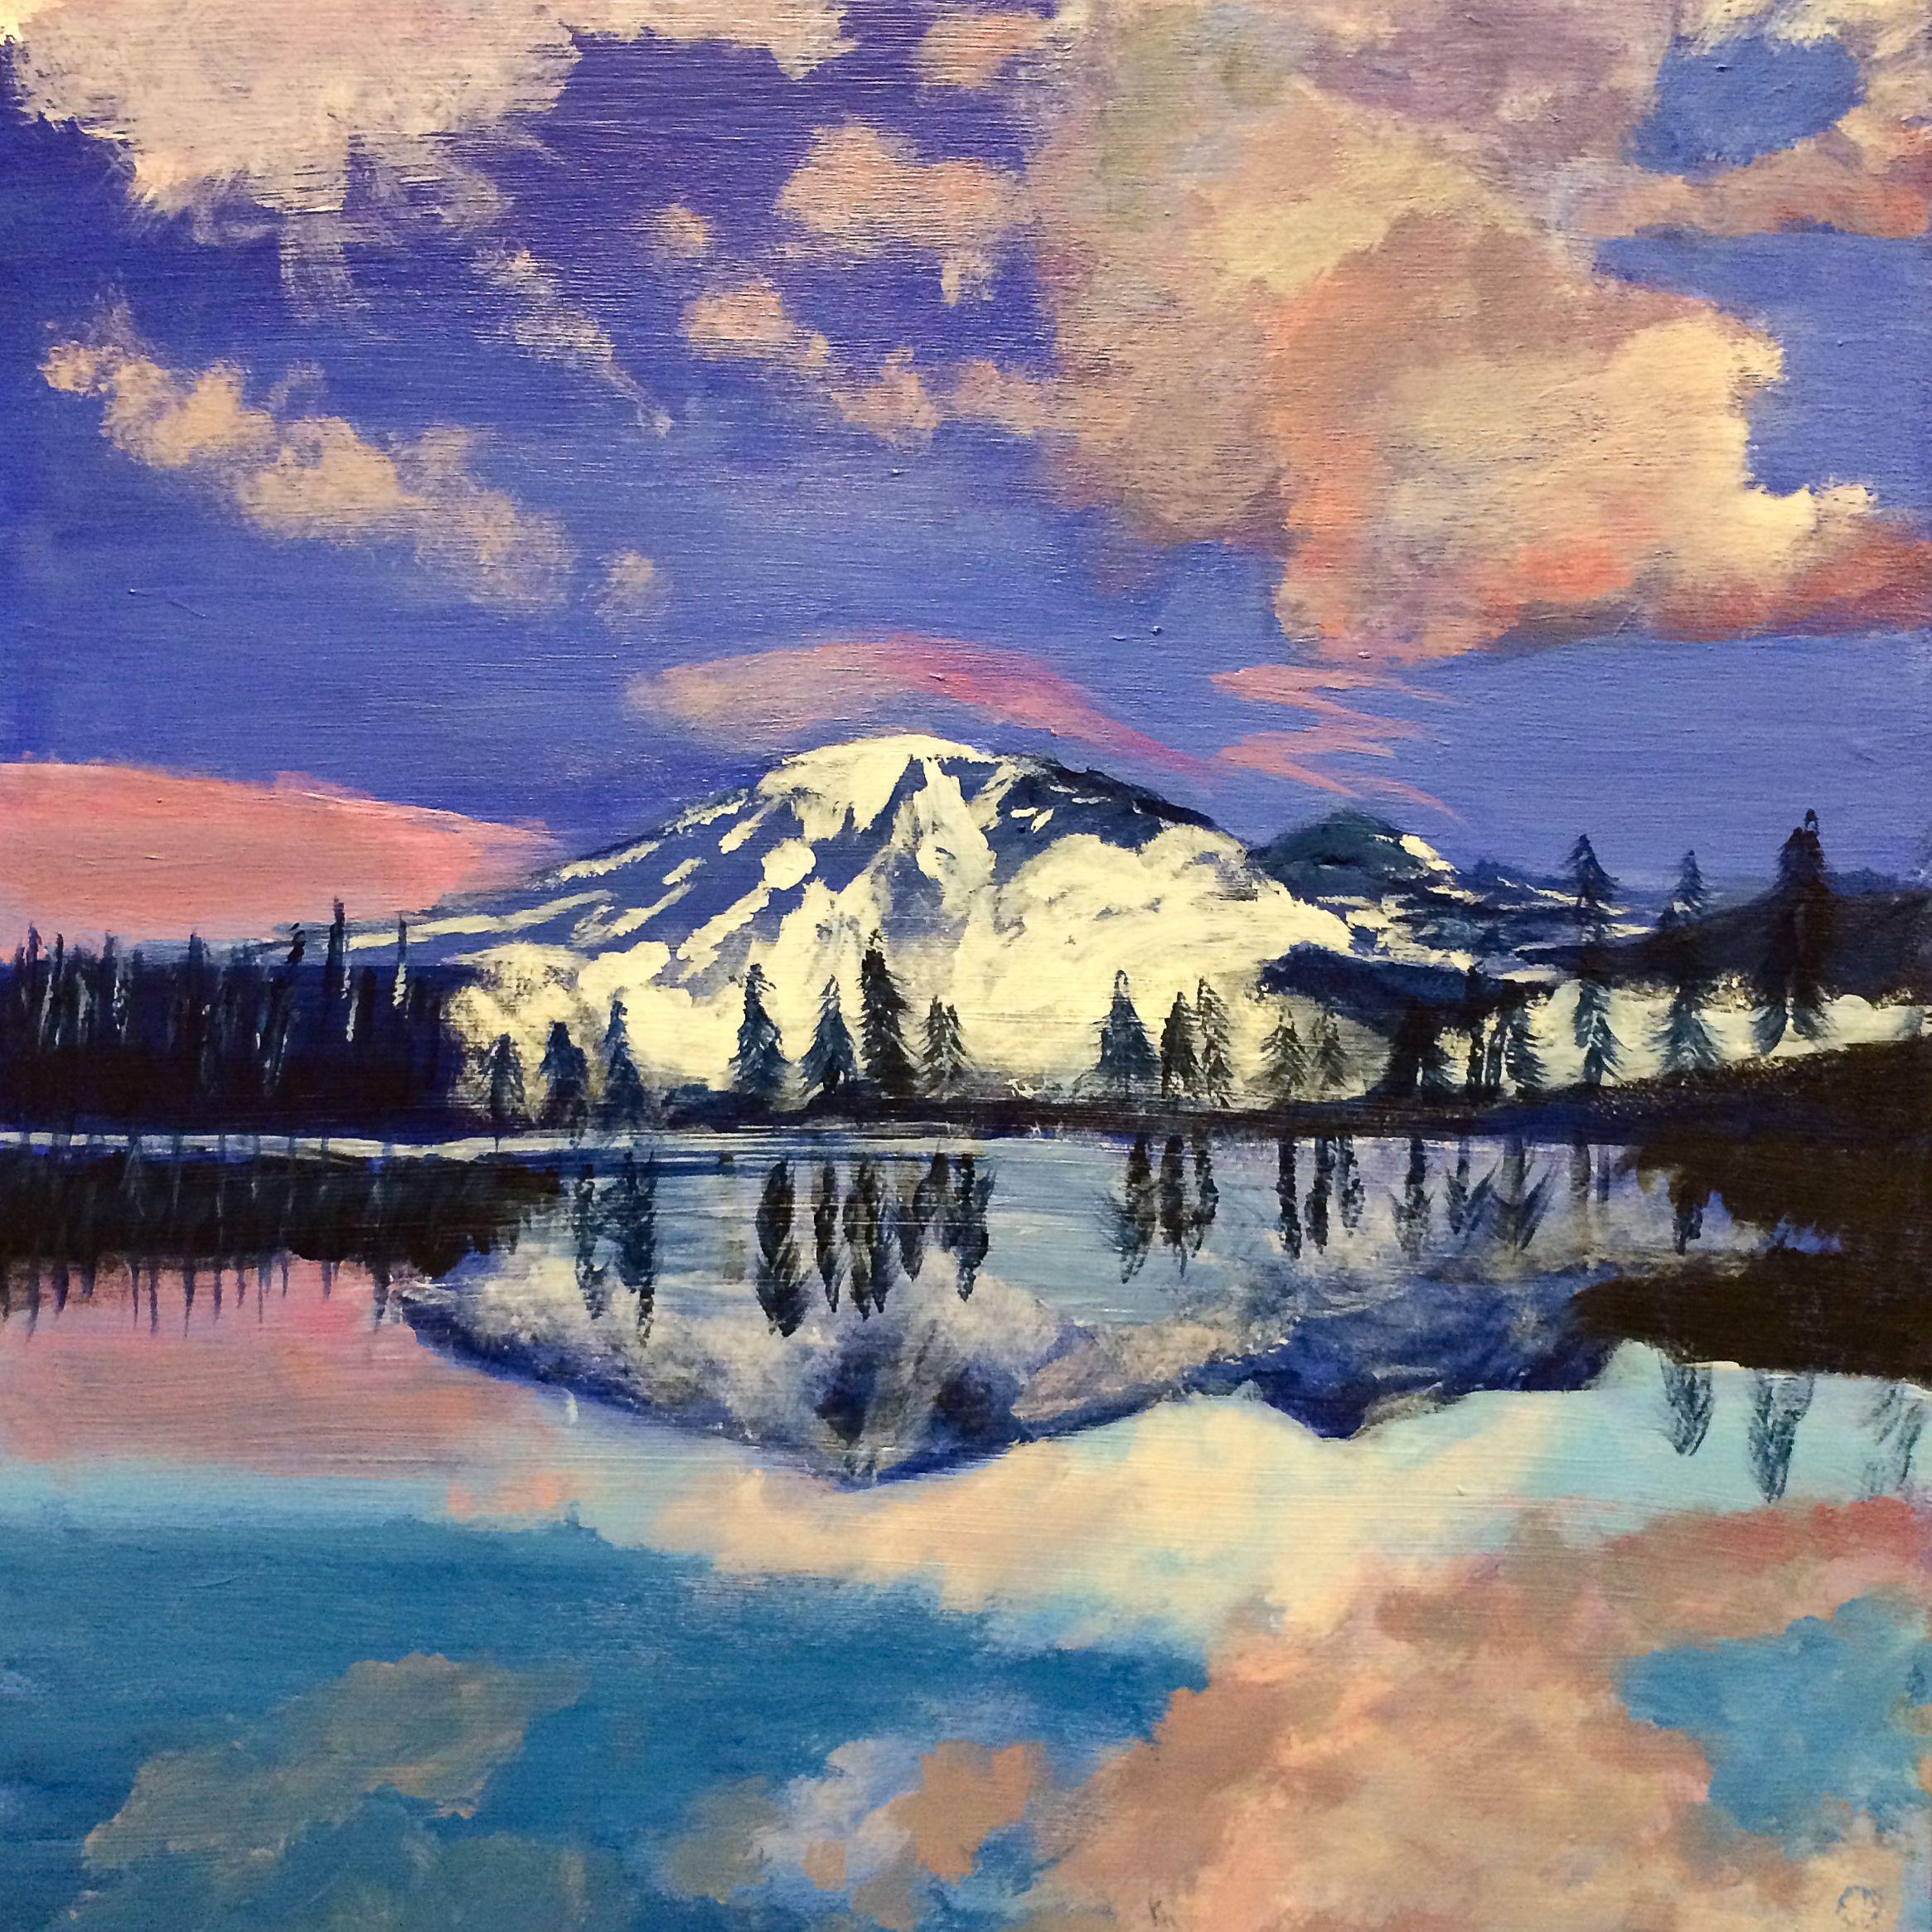 Mt Rainier from Reflection Lake